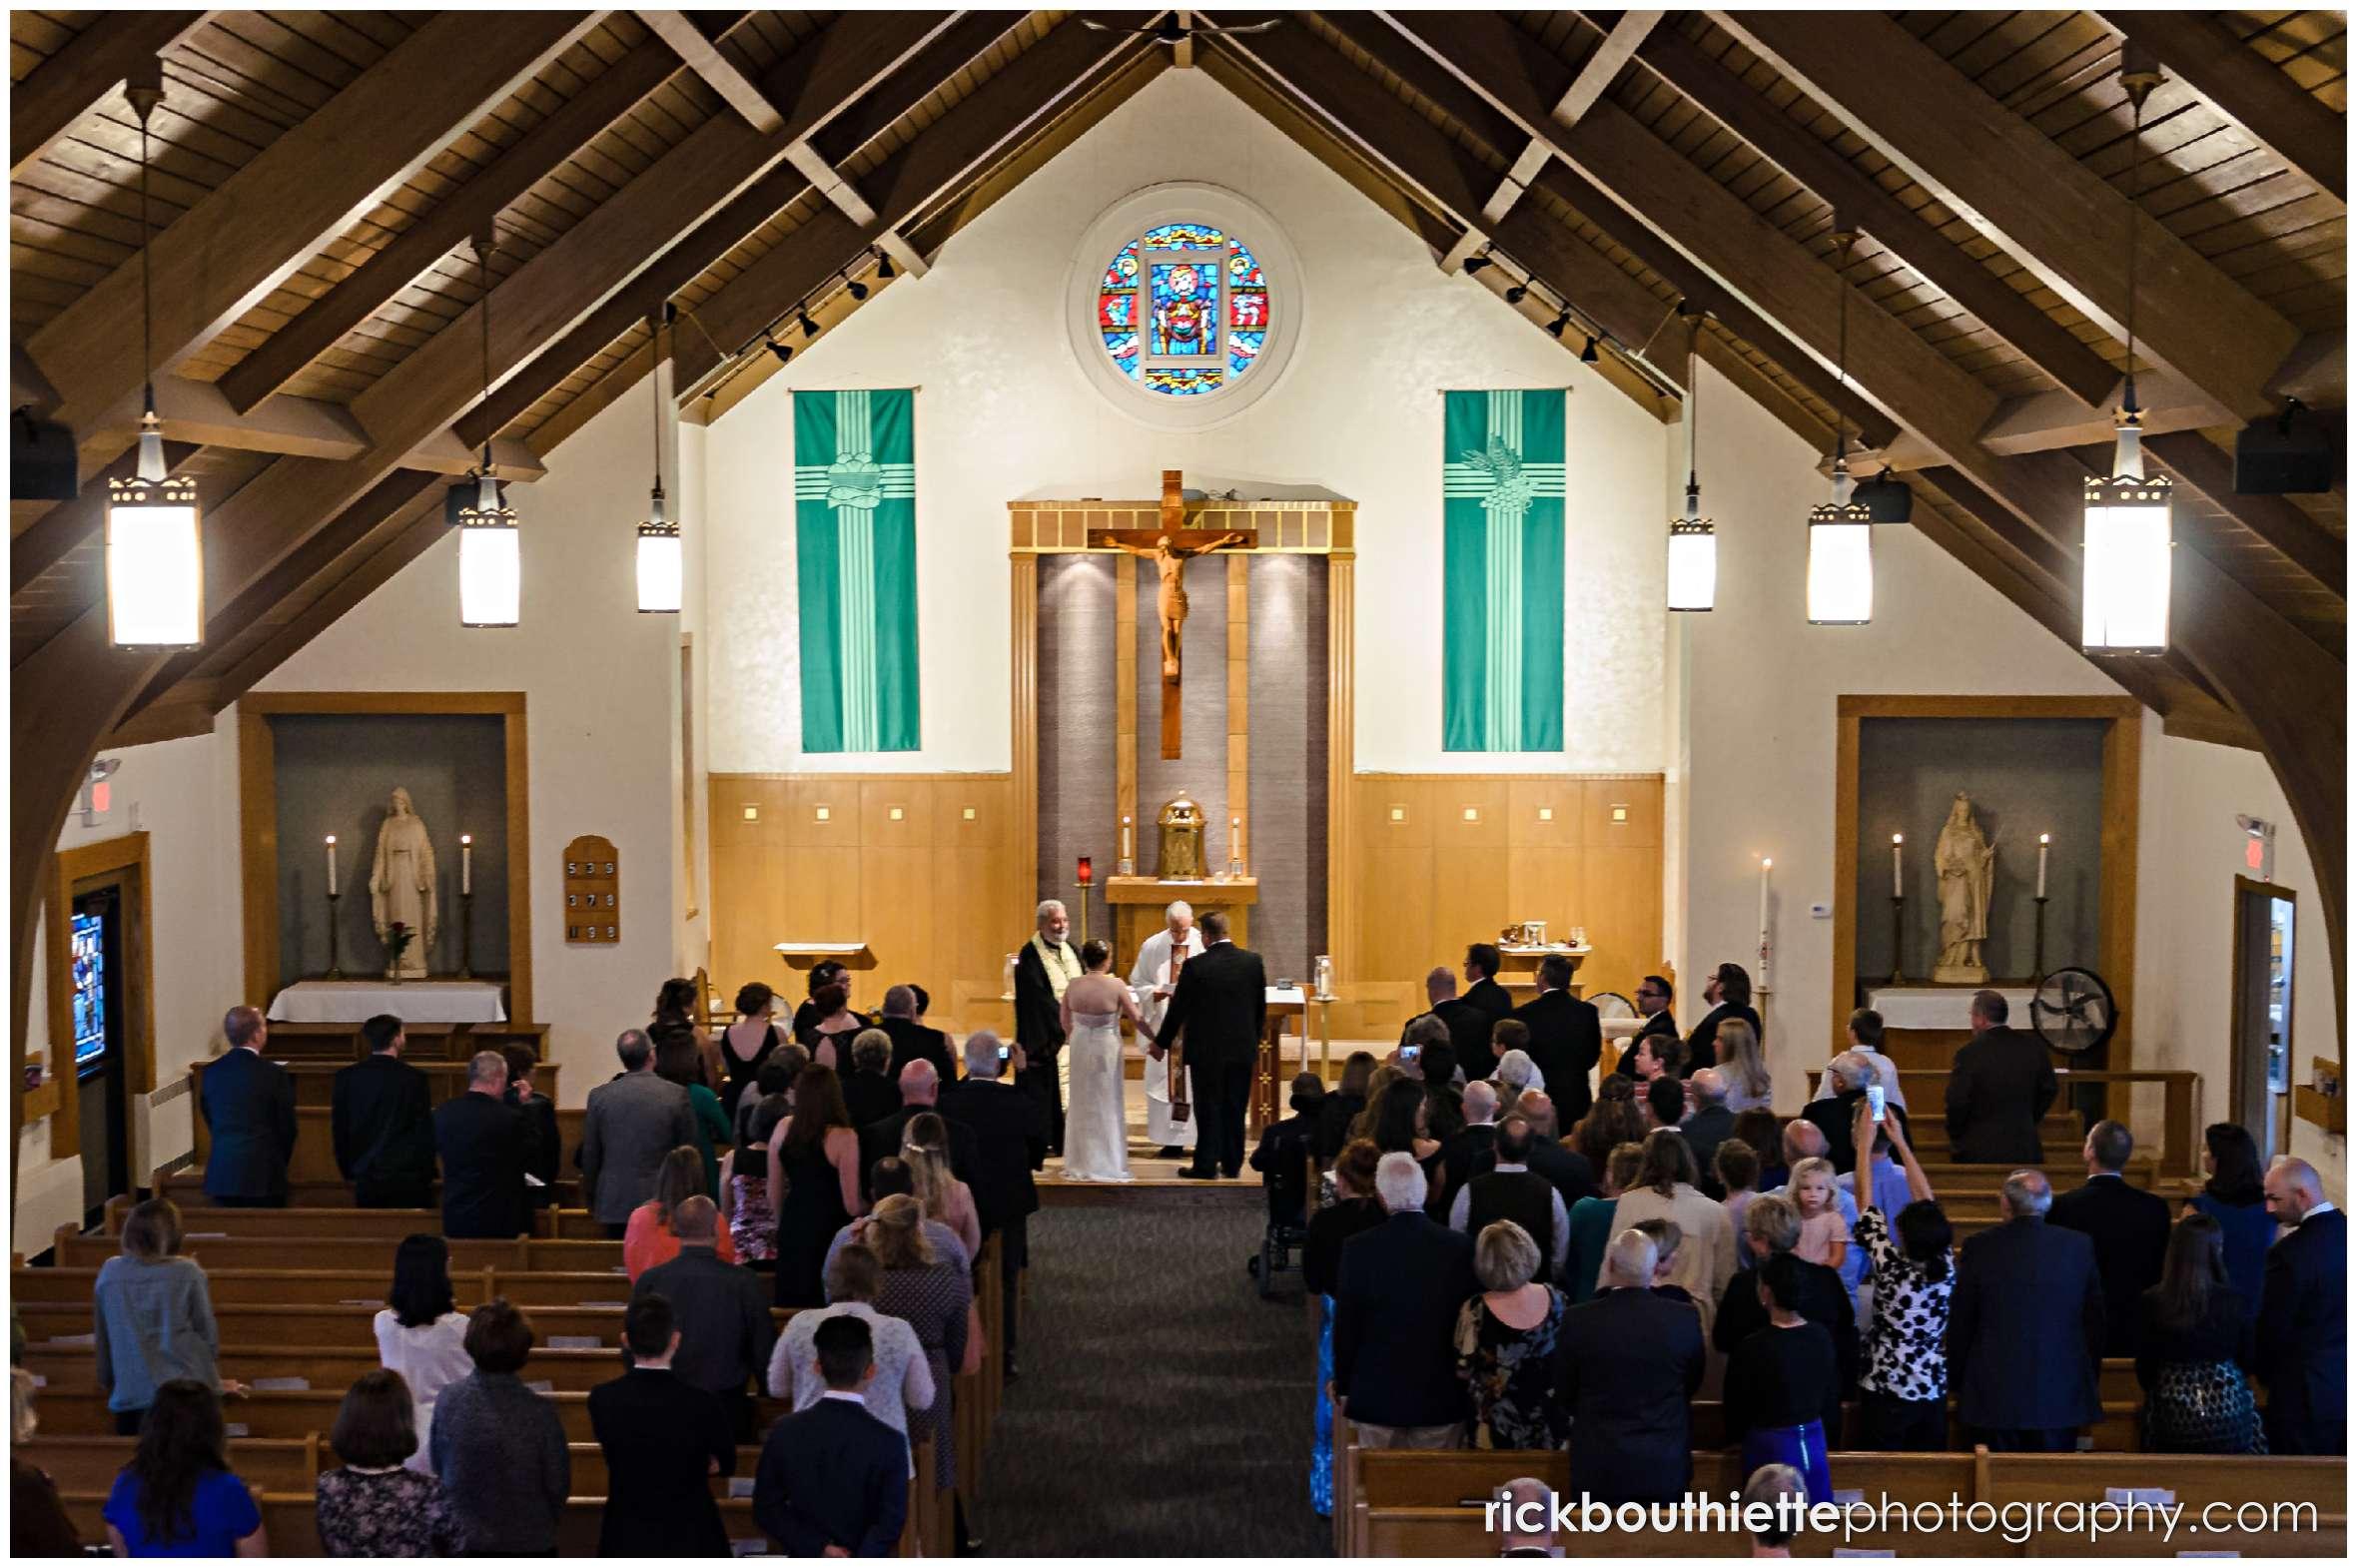 New Hampshire seacoast wedding ceremony at Saint Elizabeth of Hungary Mission Church